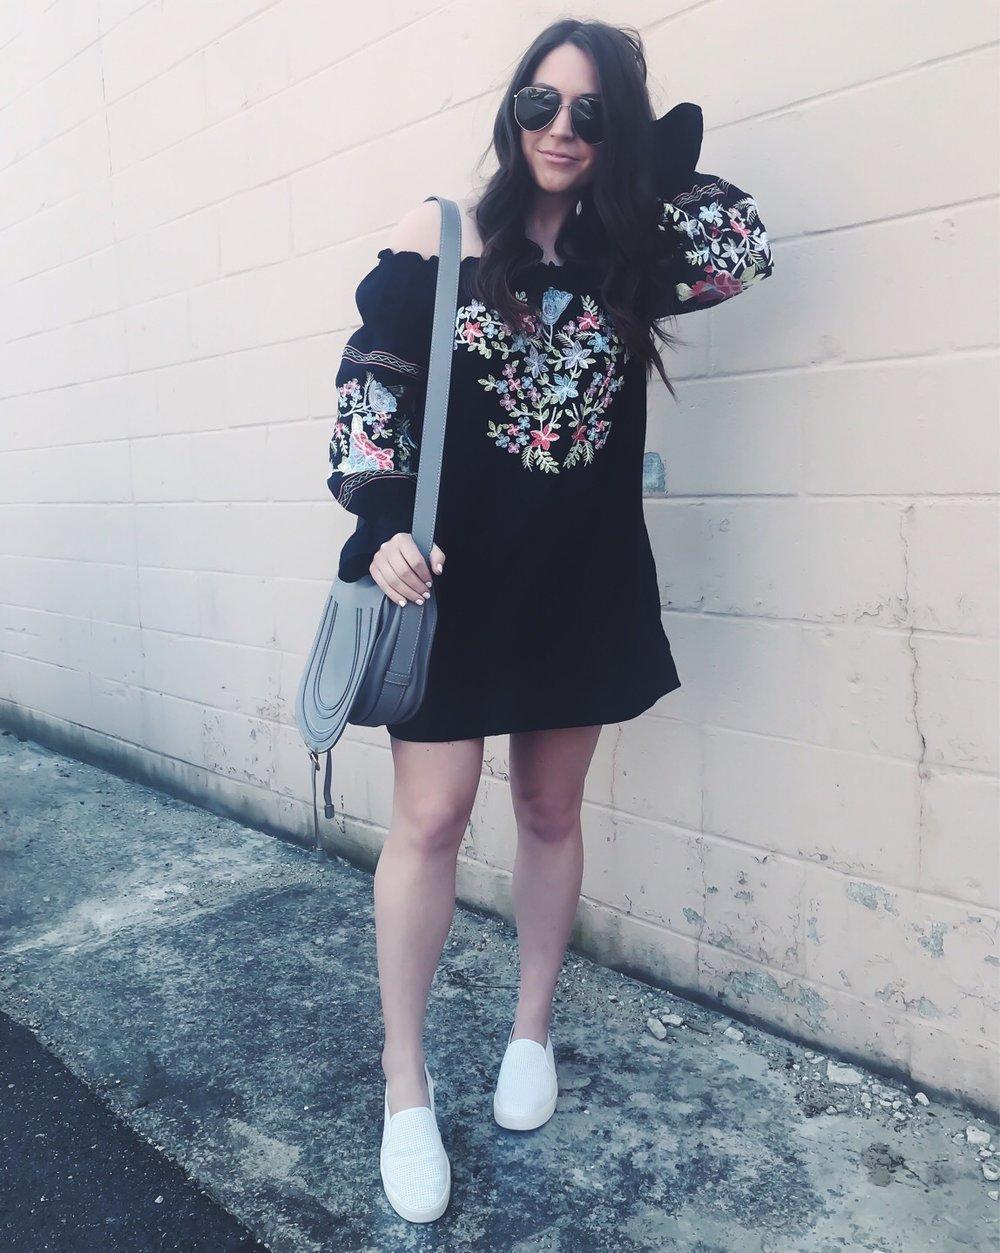 Instagram Round Up | Pine Barren Beauty | free people dress, boho dress, Vince slip ons, summer outfit idea